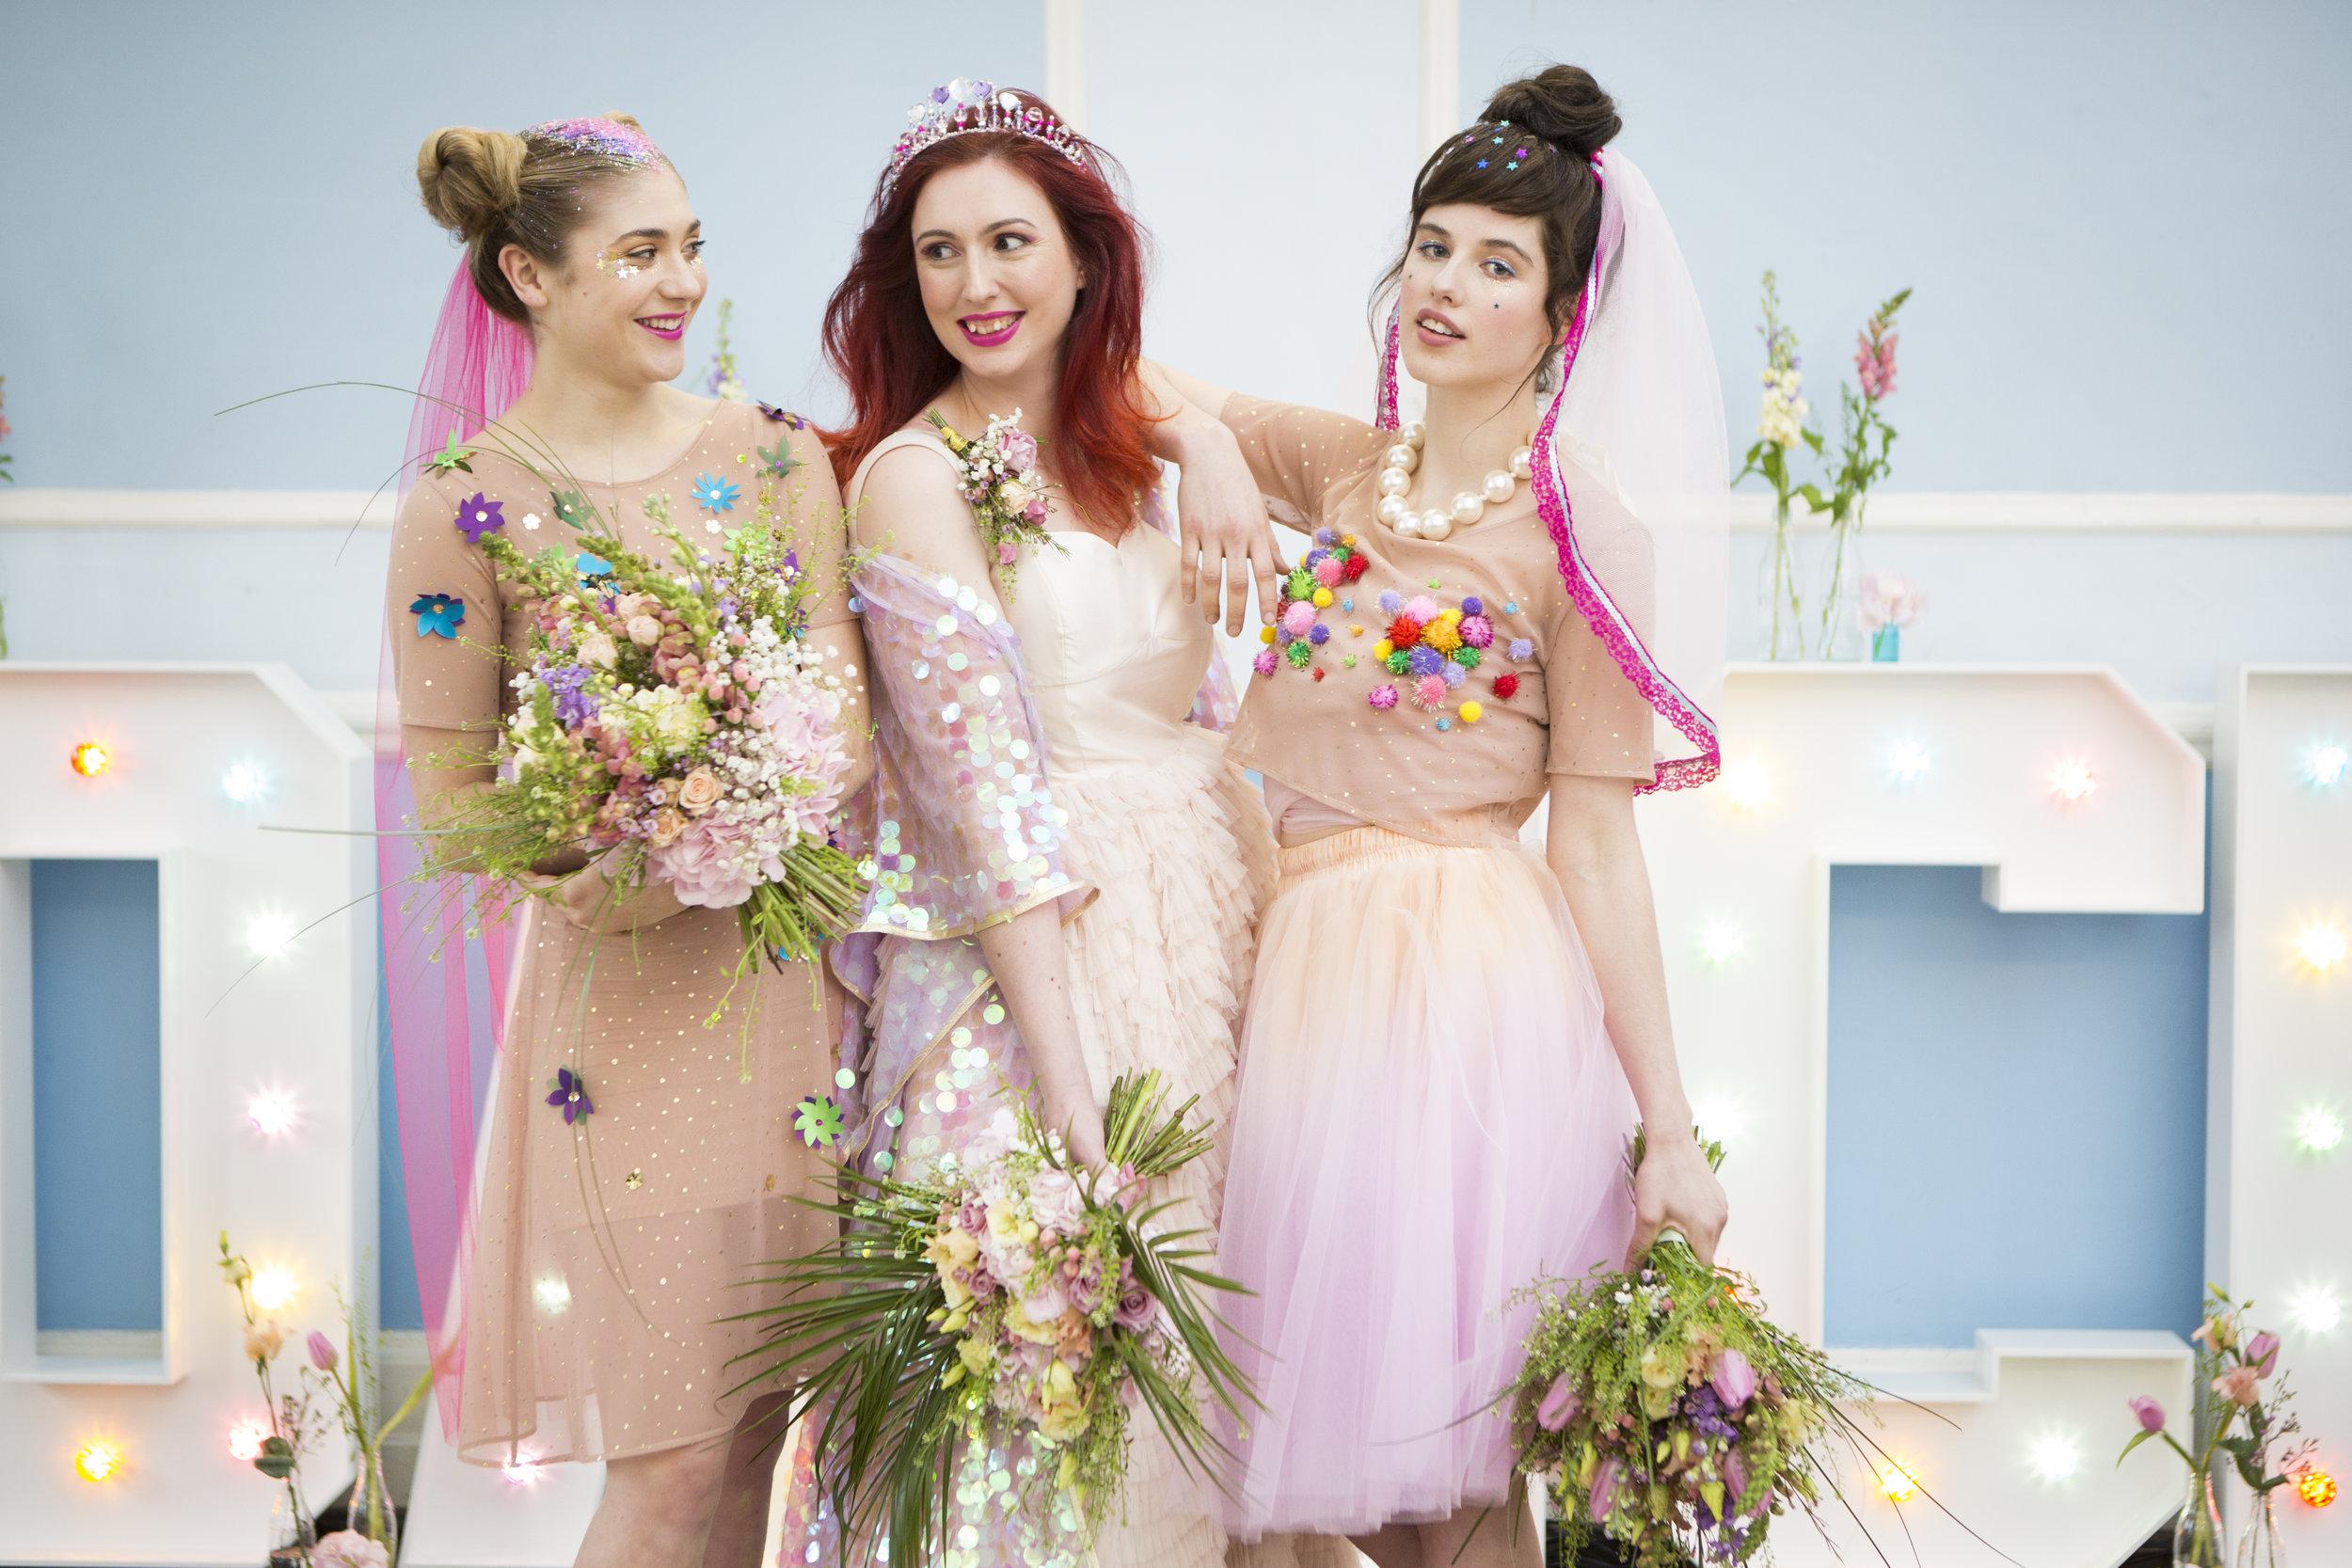 Prom Night Wedding Shoot Meadham Kirchhoff Carrie 00106.jpg